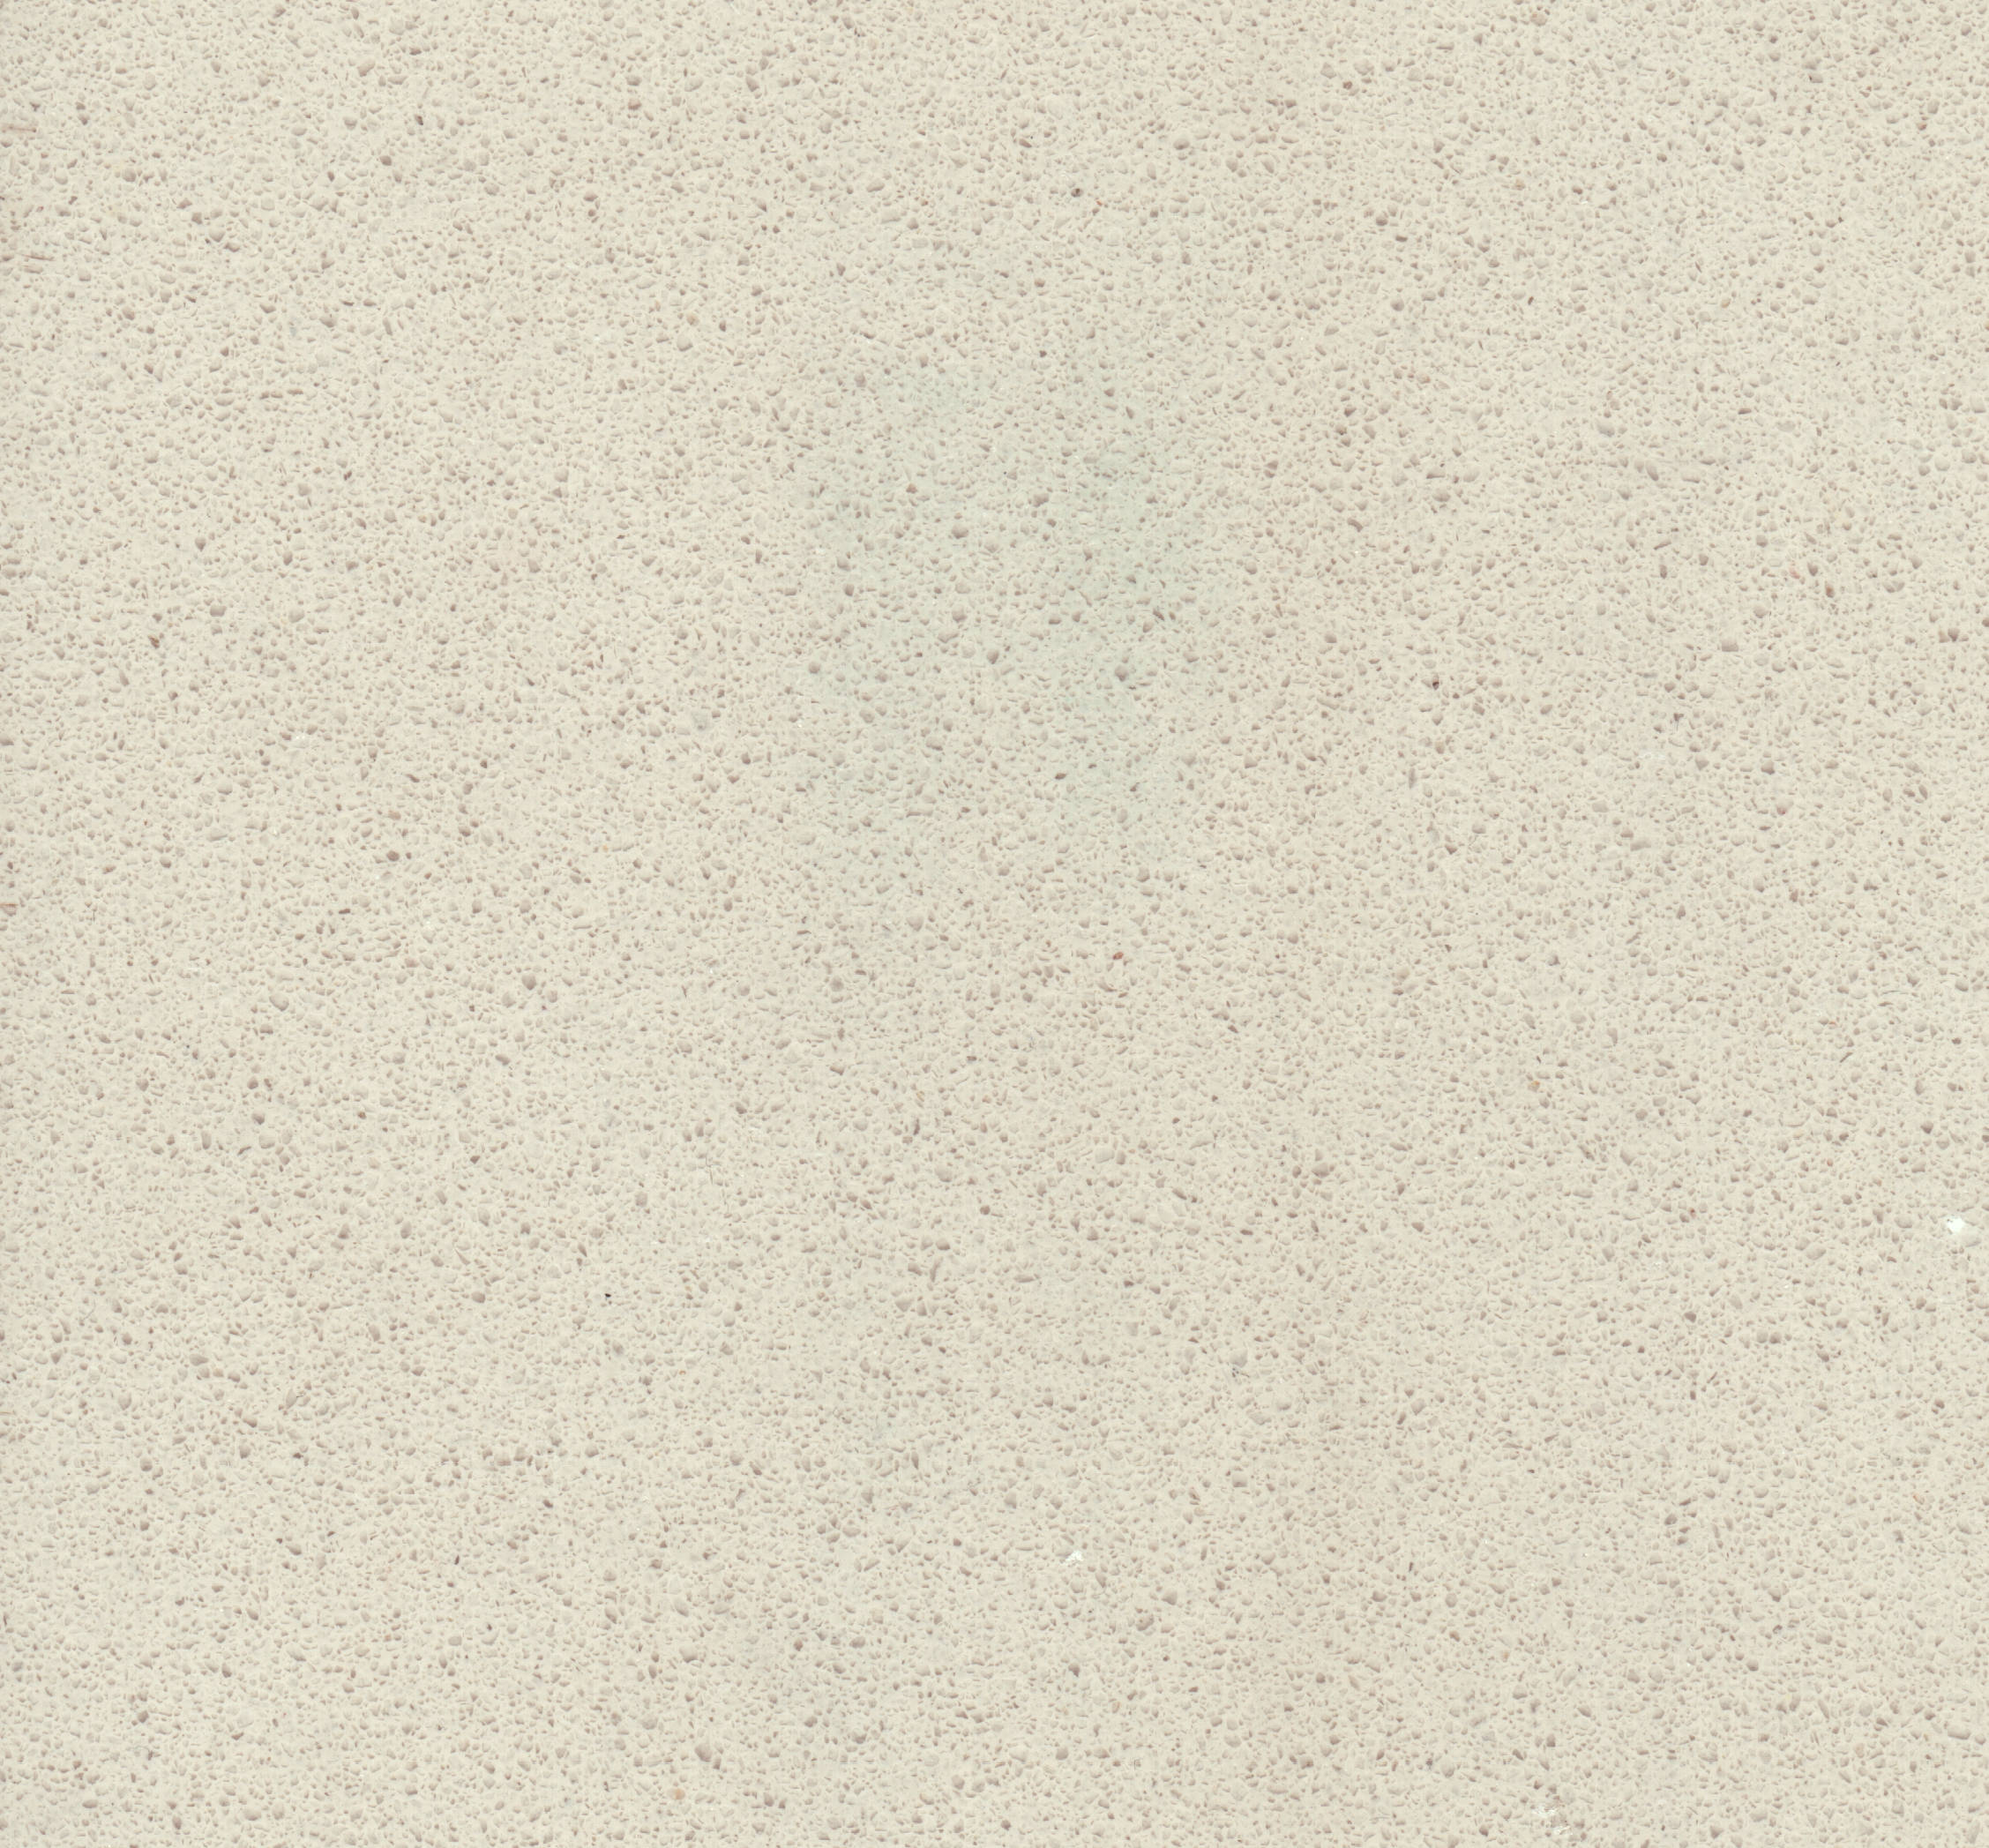 Atem кварц камень Beige light 0022